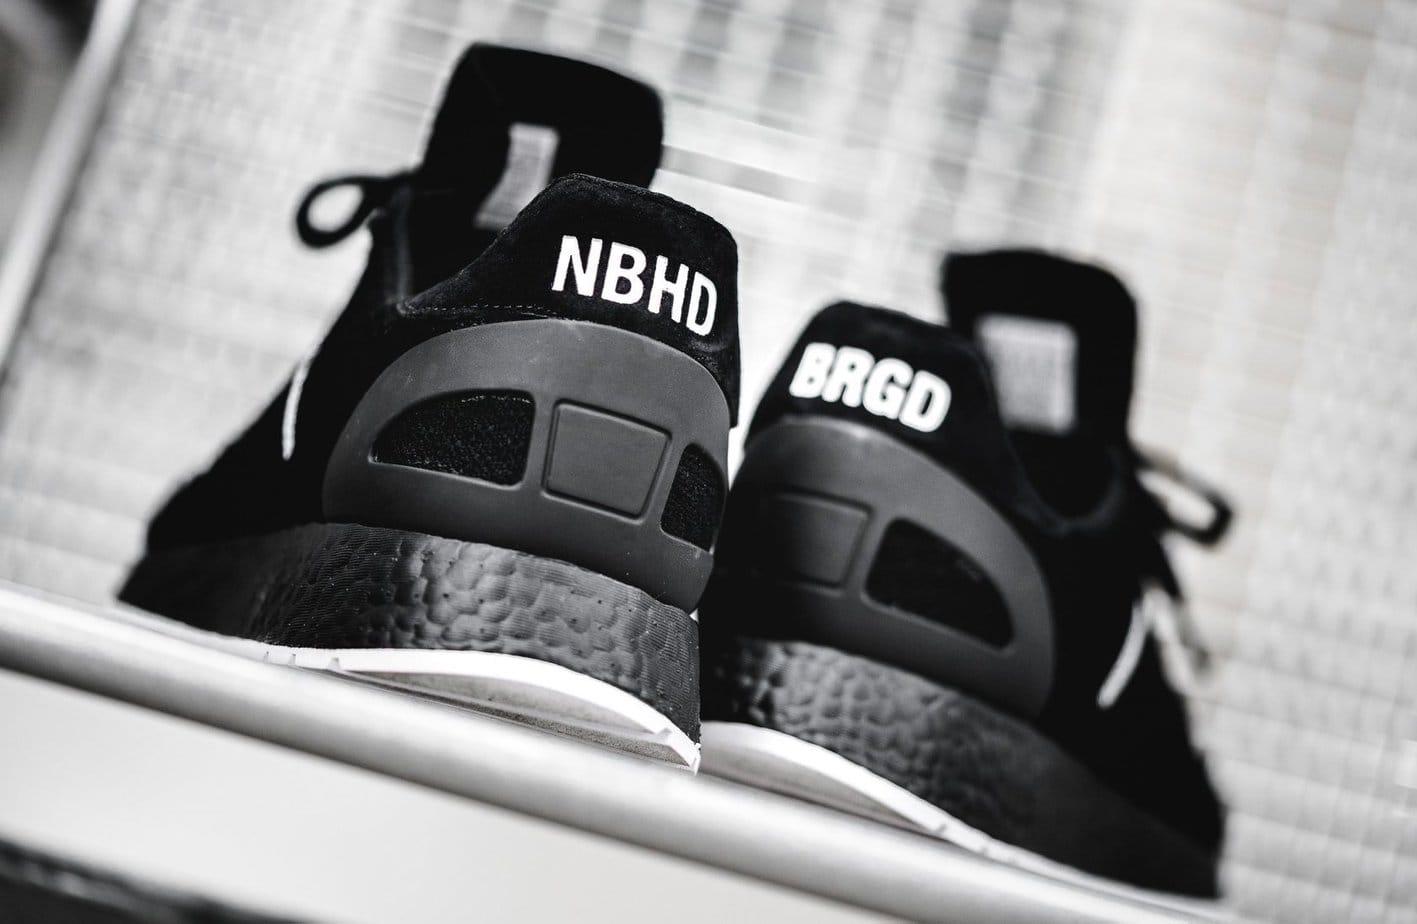 new product 3dc77 f0223 Neighborhood x adidas Collection Online Links - JustFreshKic